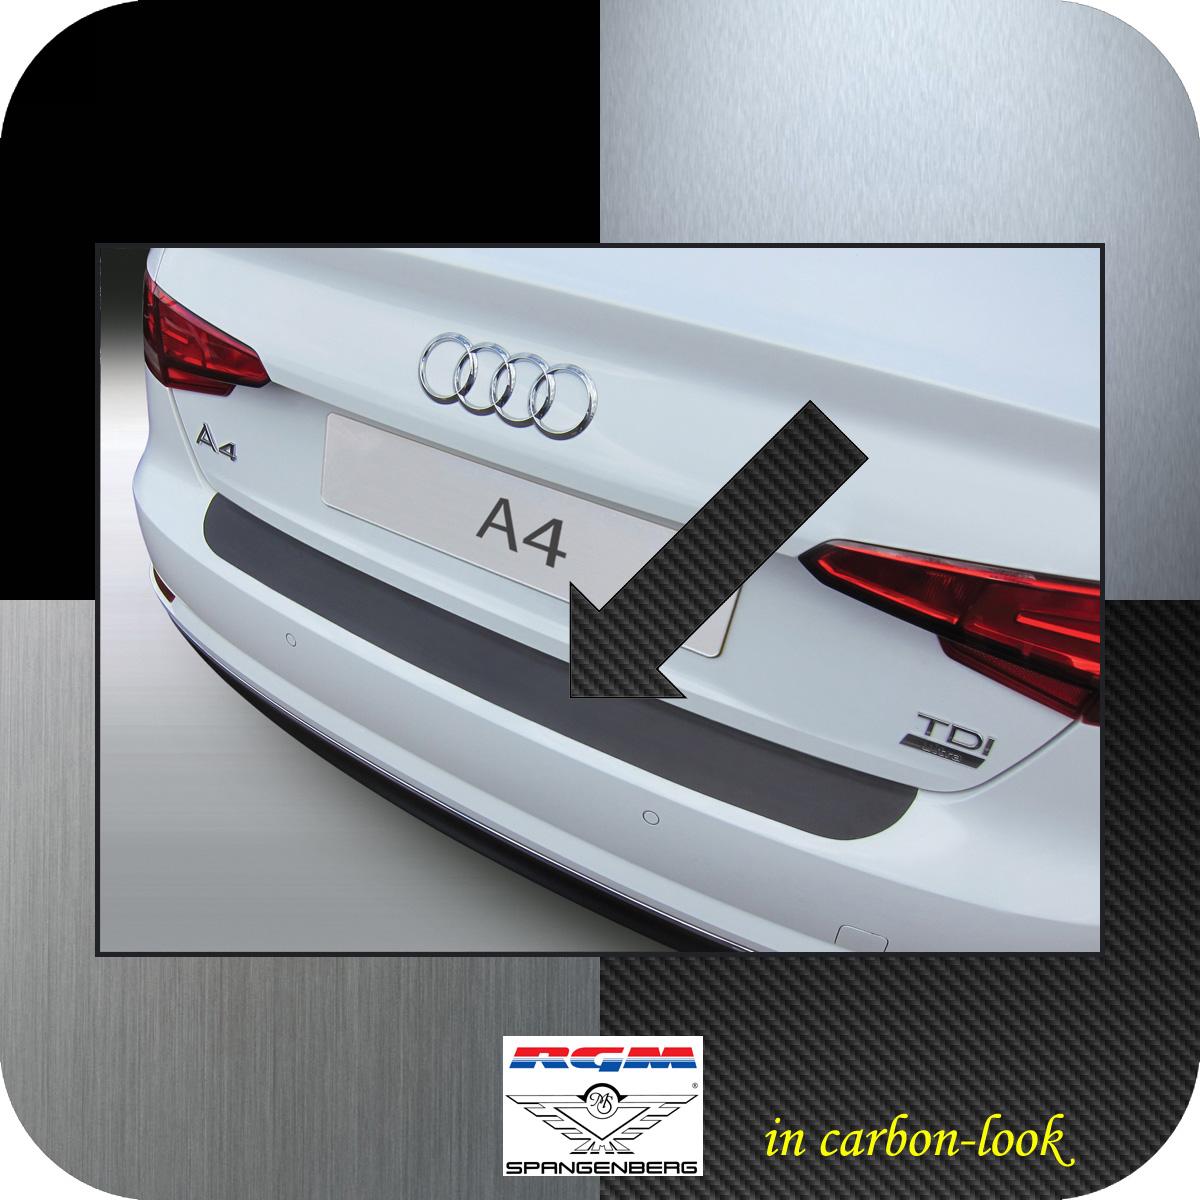 Ladekantenschutz Carbon-Look Audi A4 B9 Limousine 4-Türer ab Bj 2015- 3509960